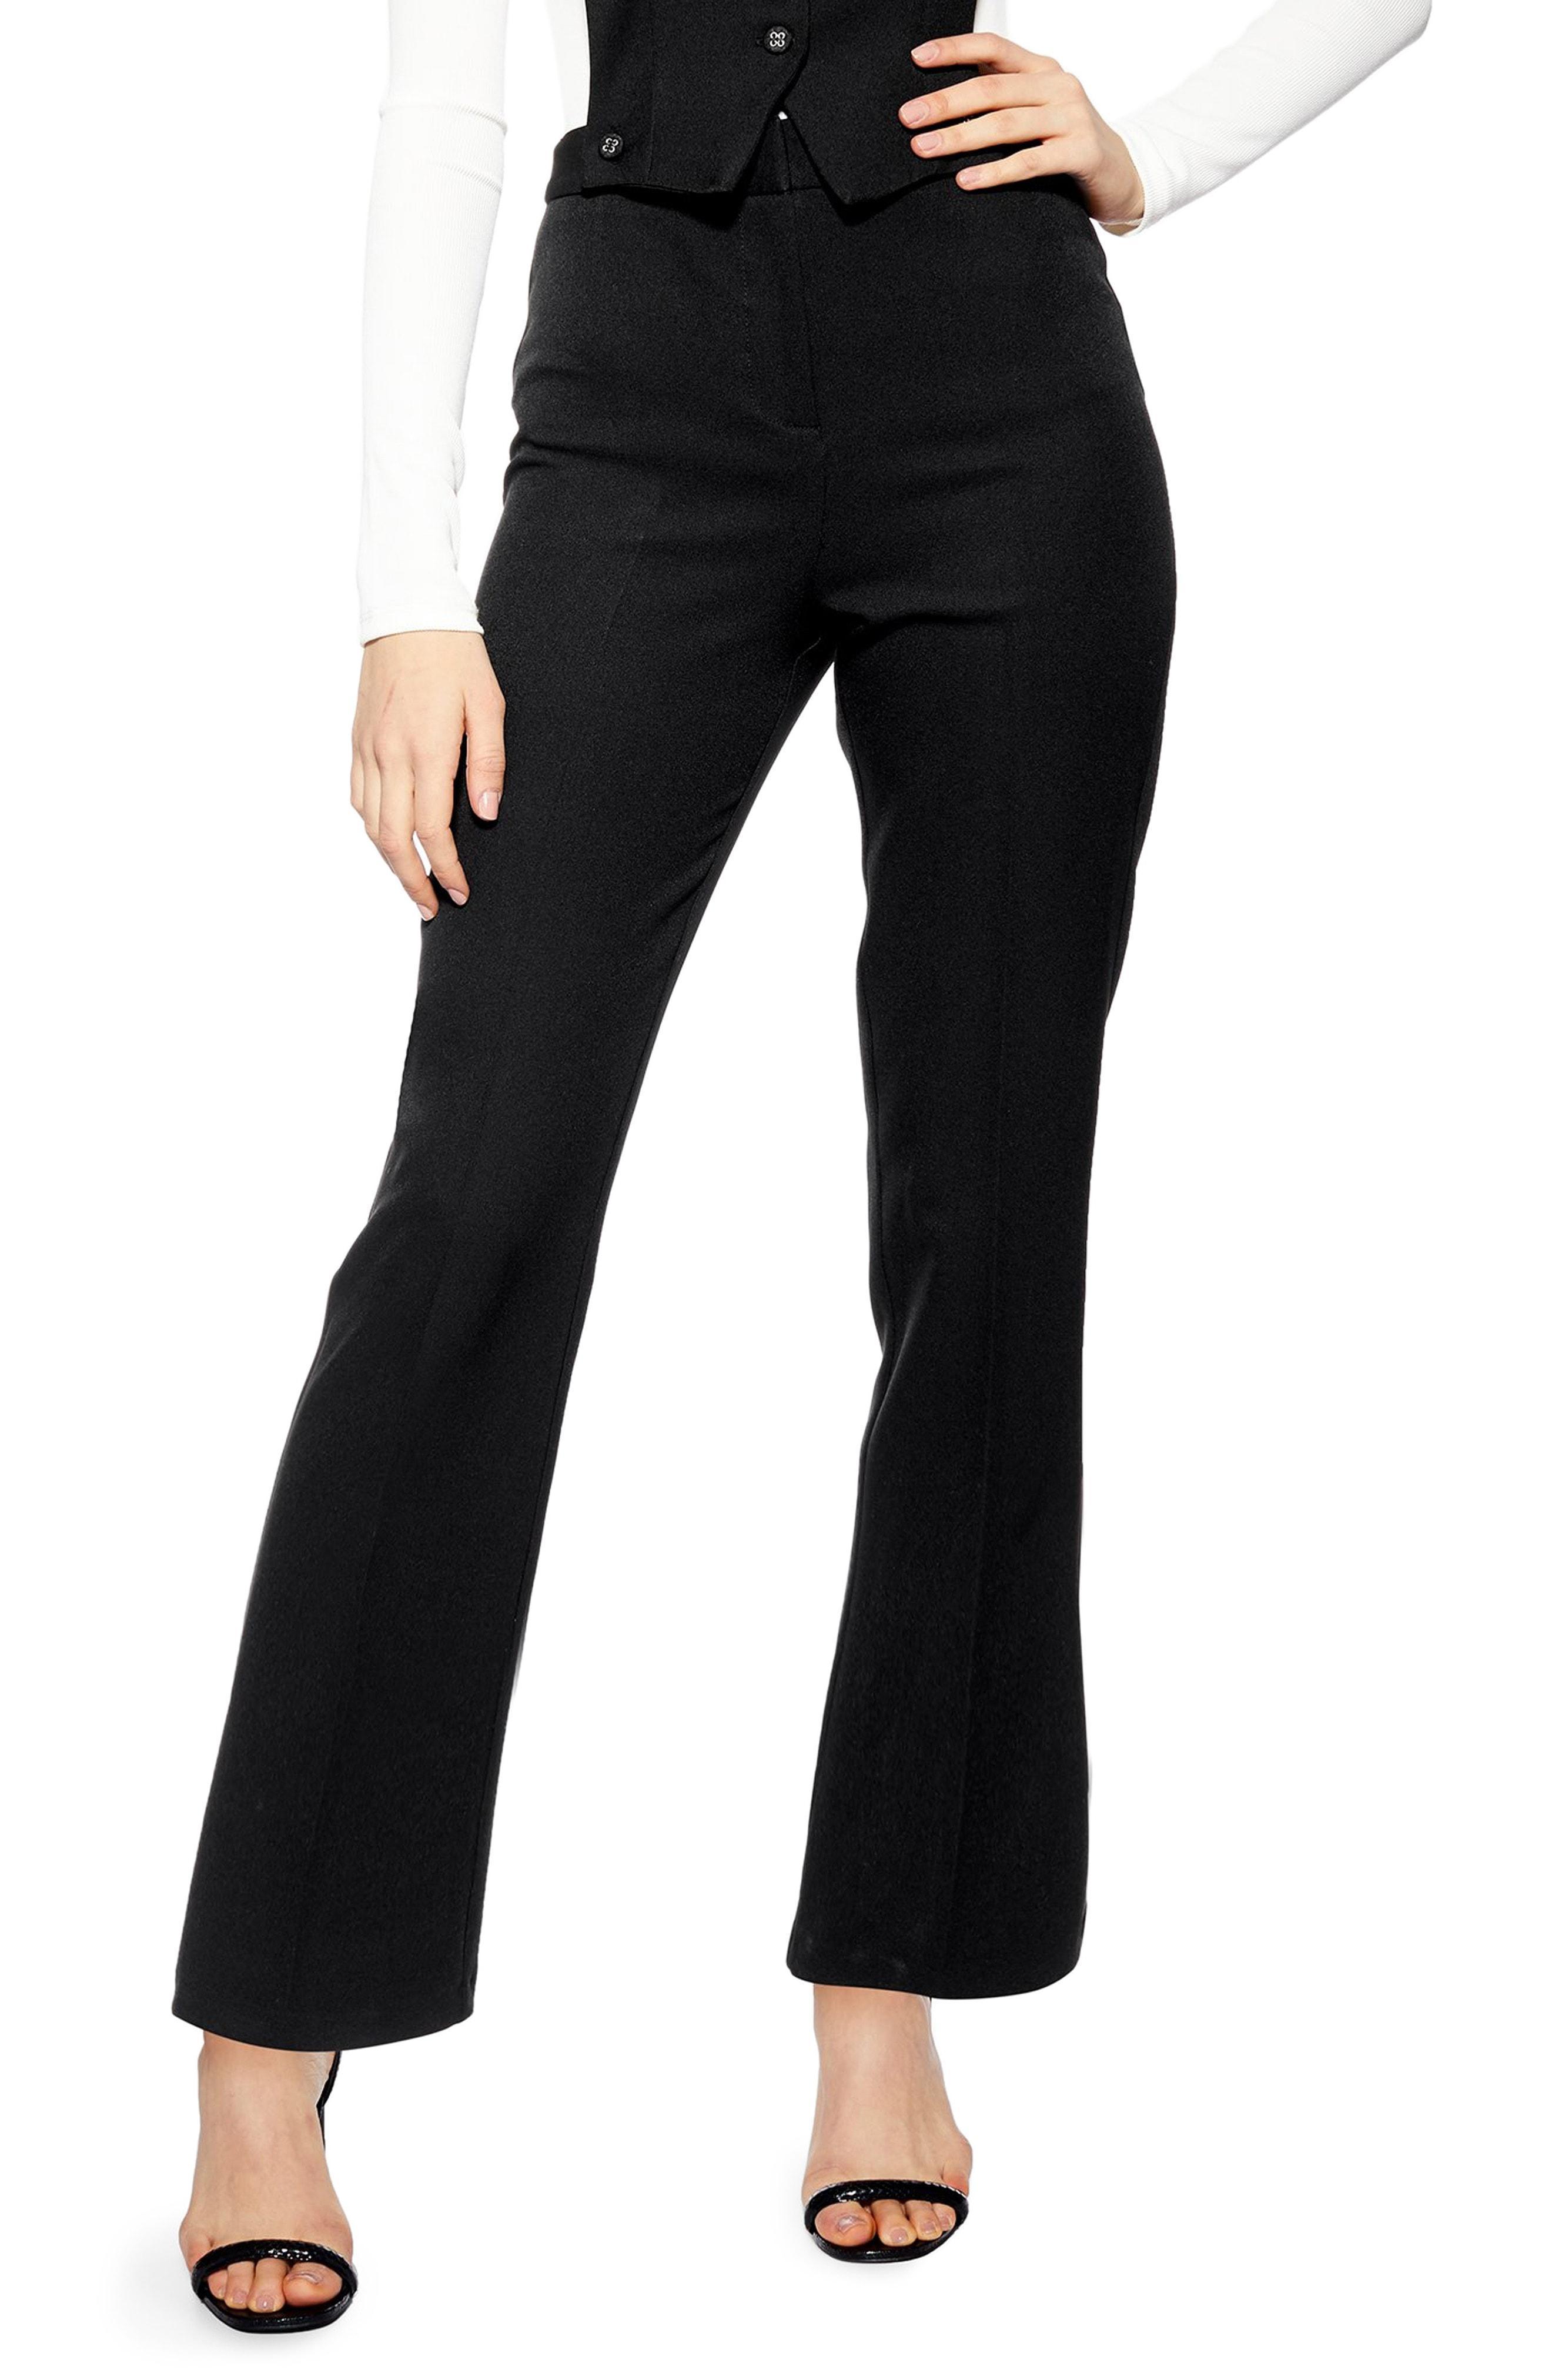 55669dbf9bb4 Lyst - Topshop 2-in-1 Waistcoat Jumpsuit in Black